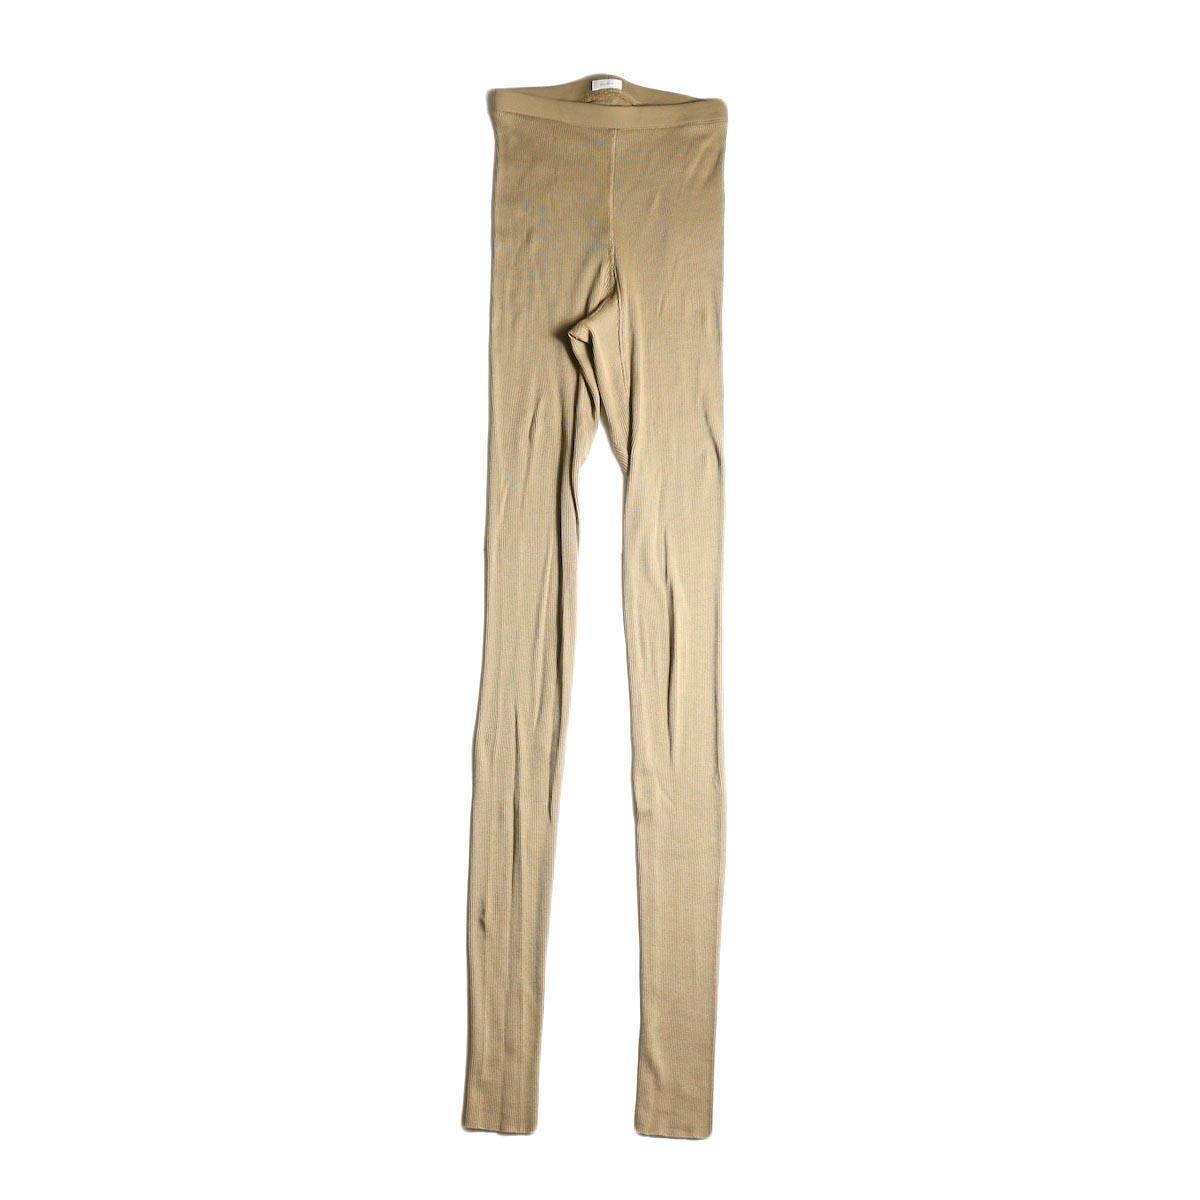 blurhms / Cotton High Stretch Rib Leggings (Beige)正面